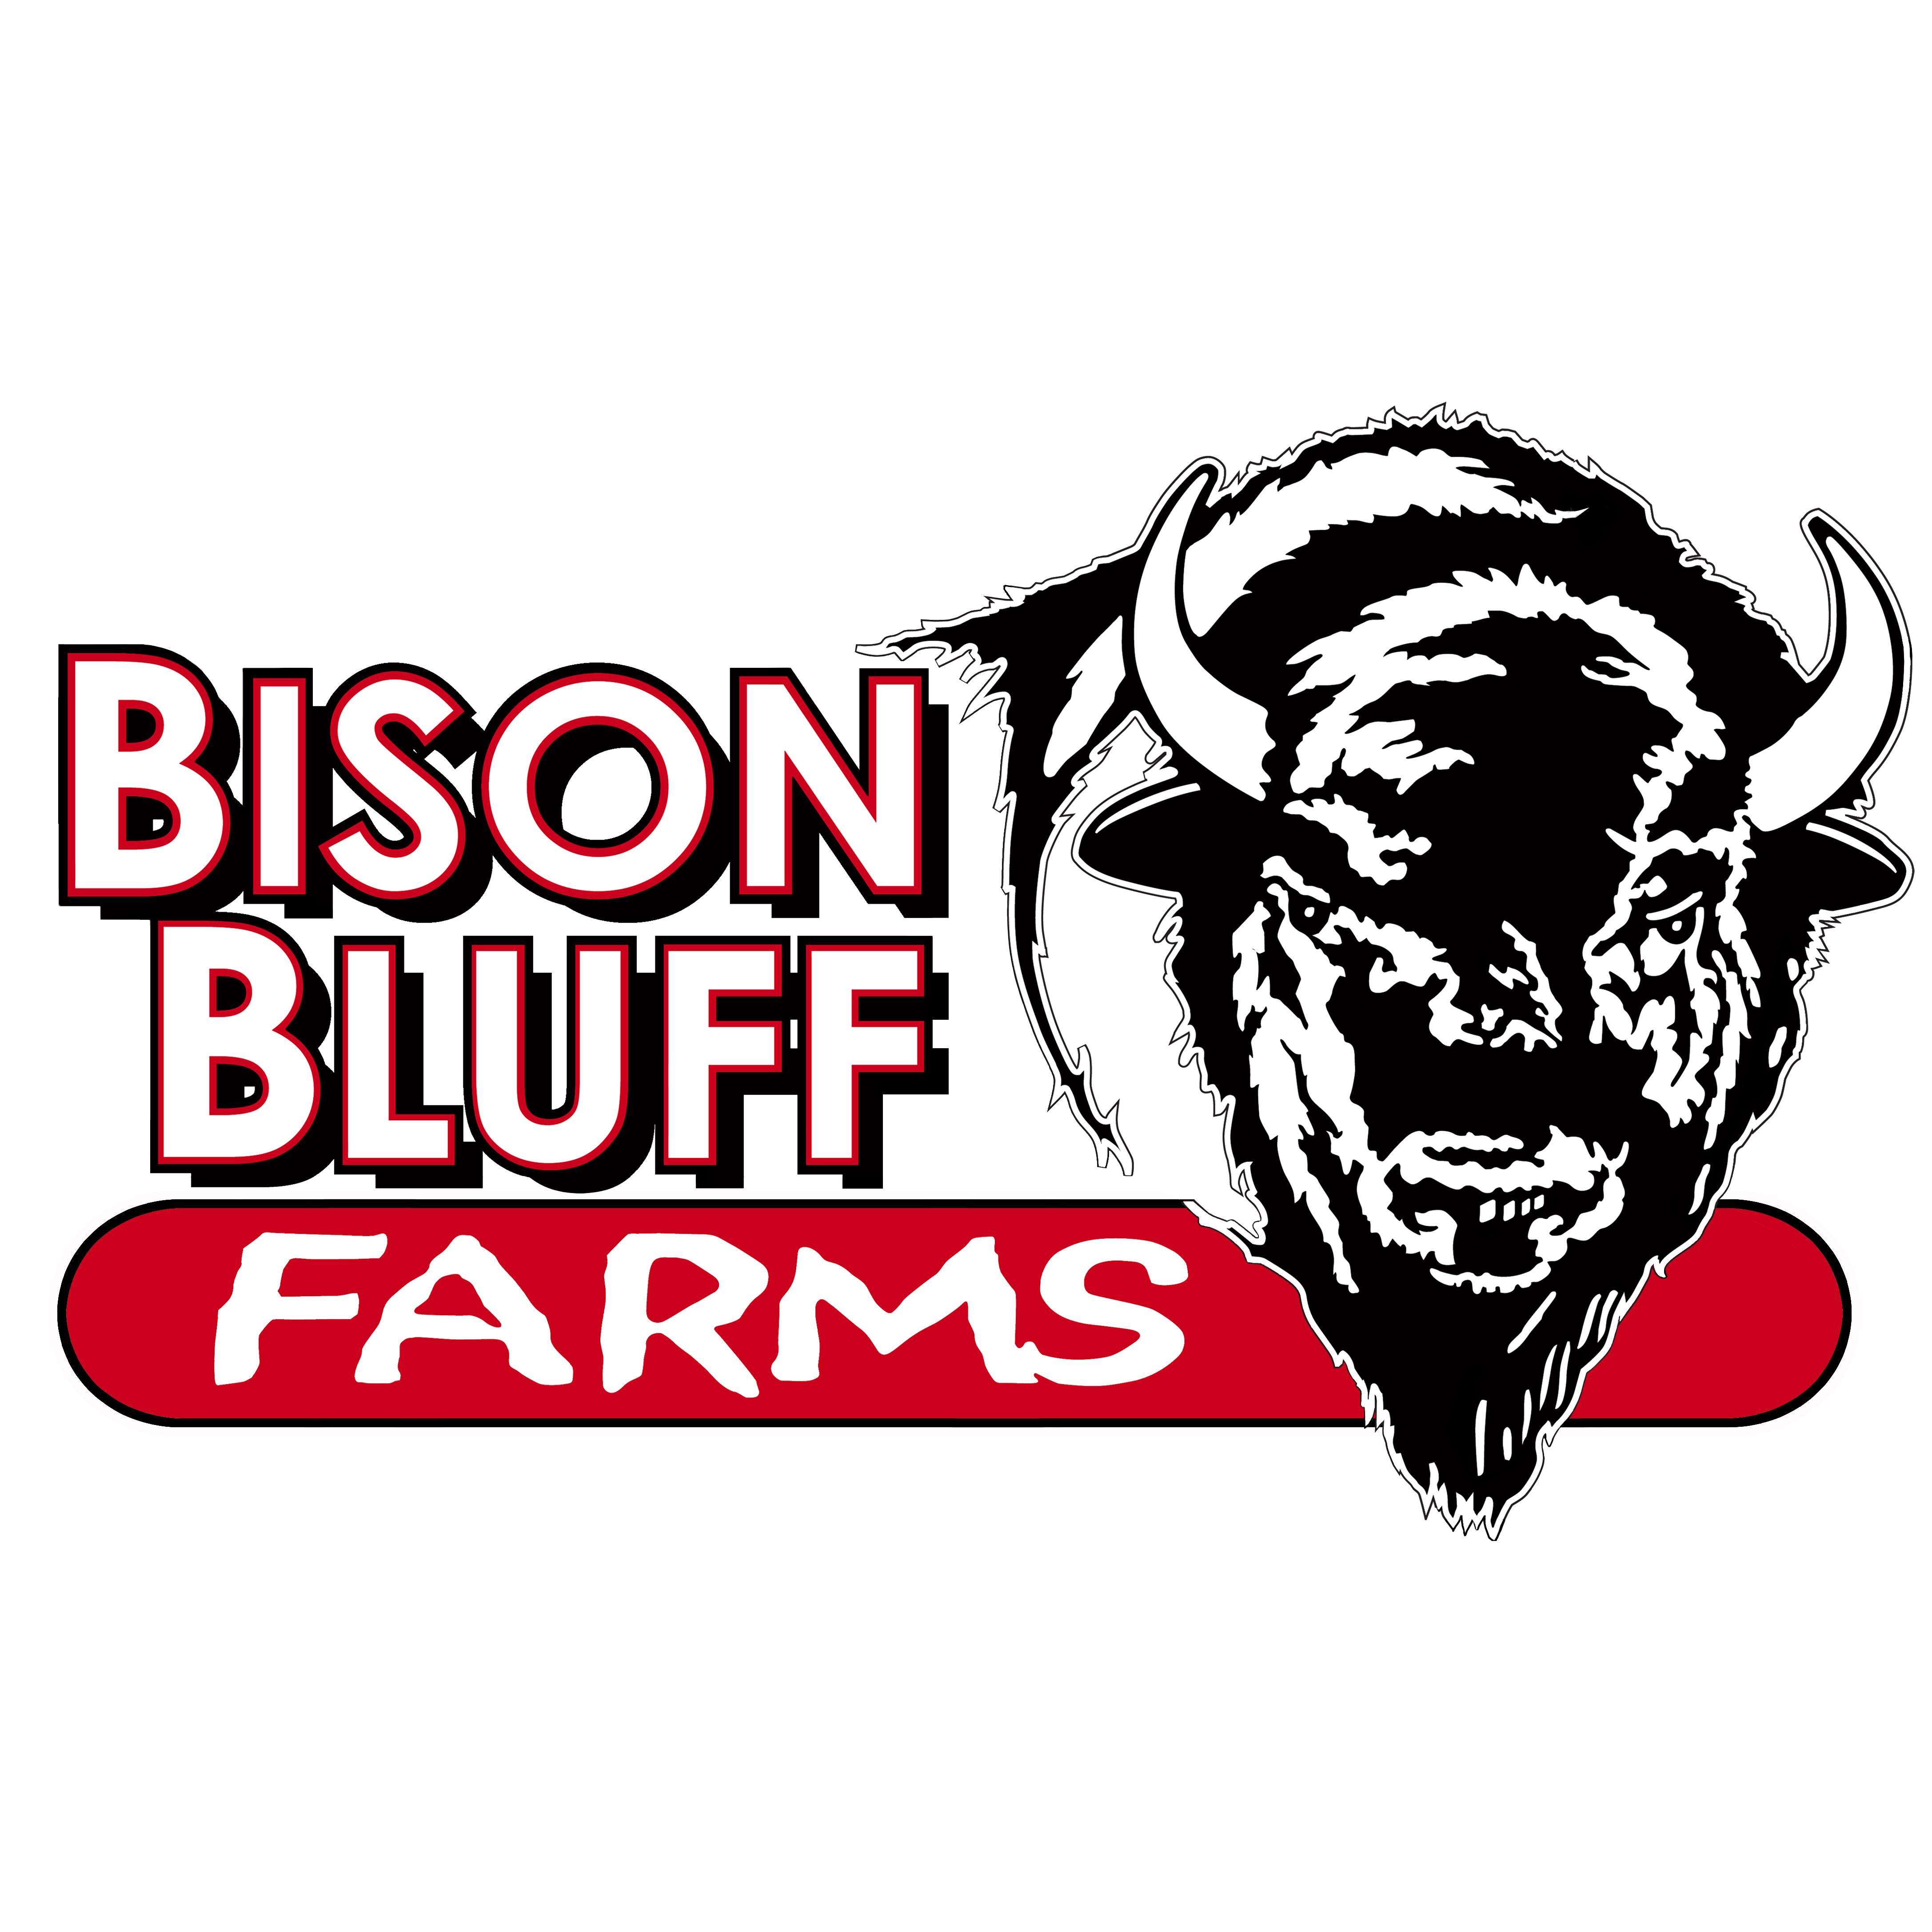 Bison Bluff Farms